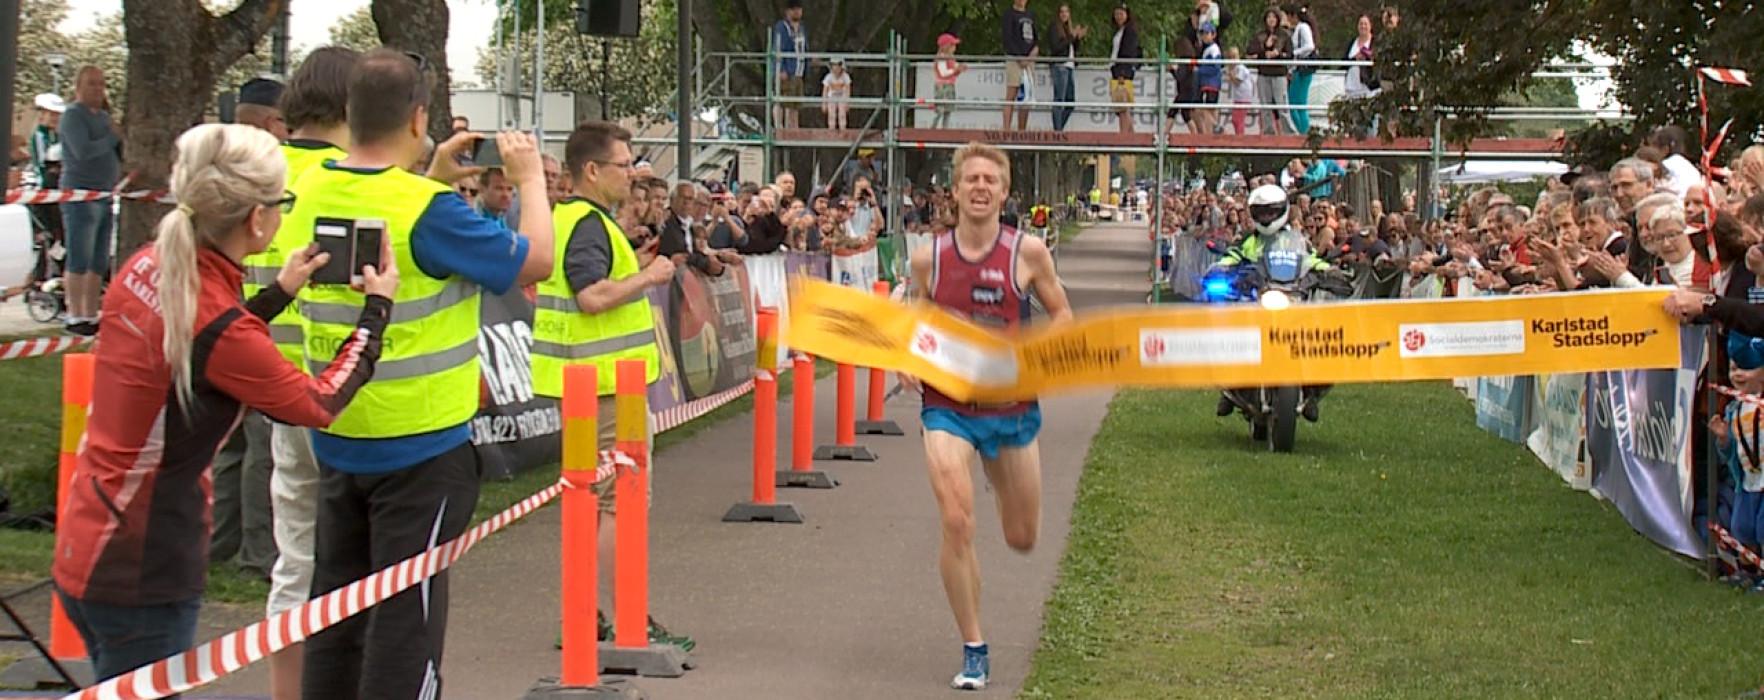 Glimt Sport – Karlstads Stadslopp 2015